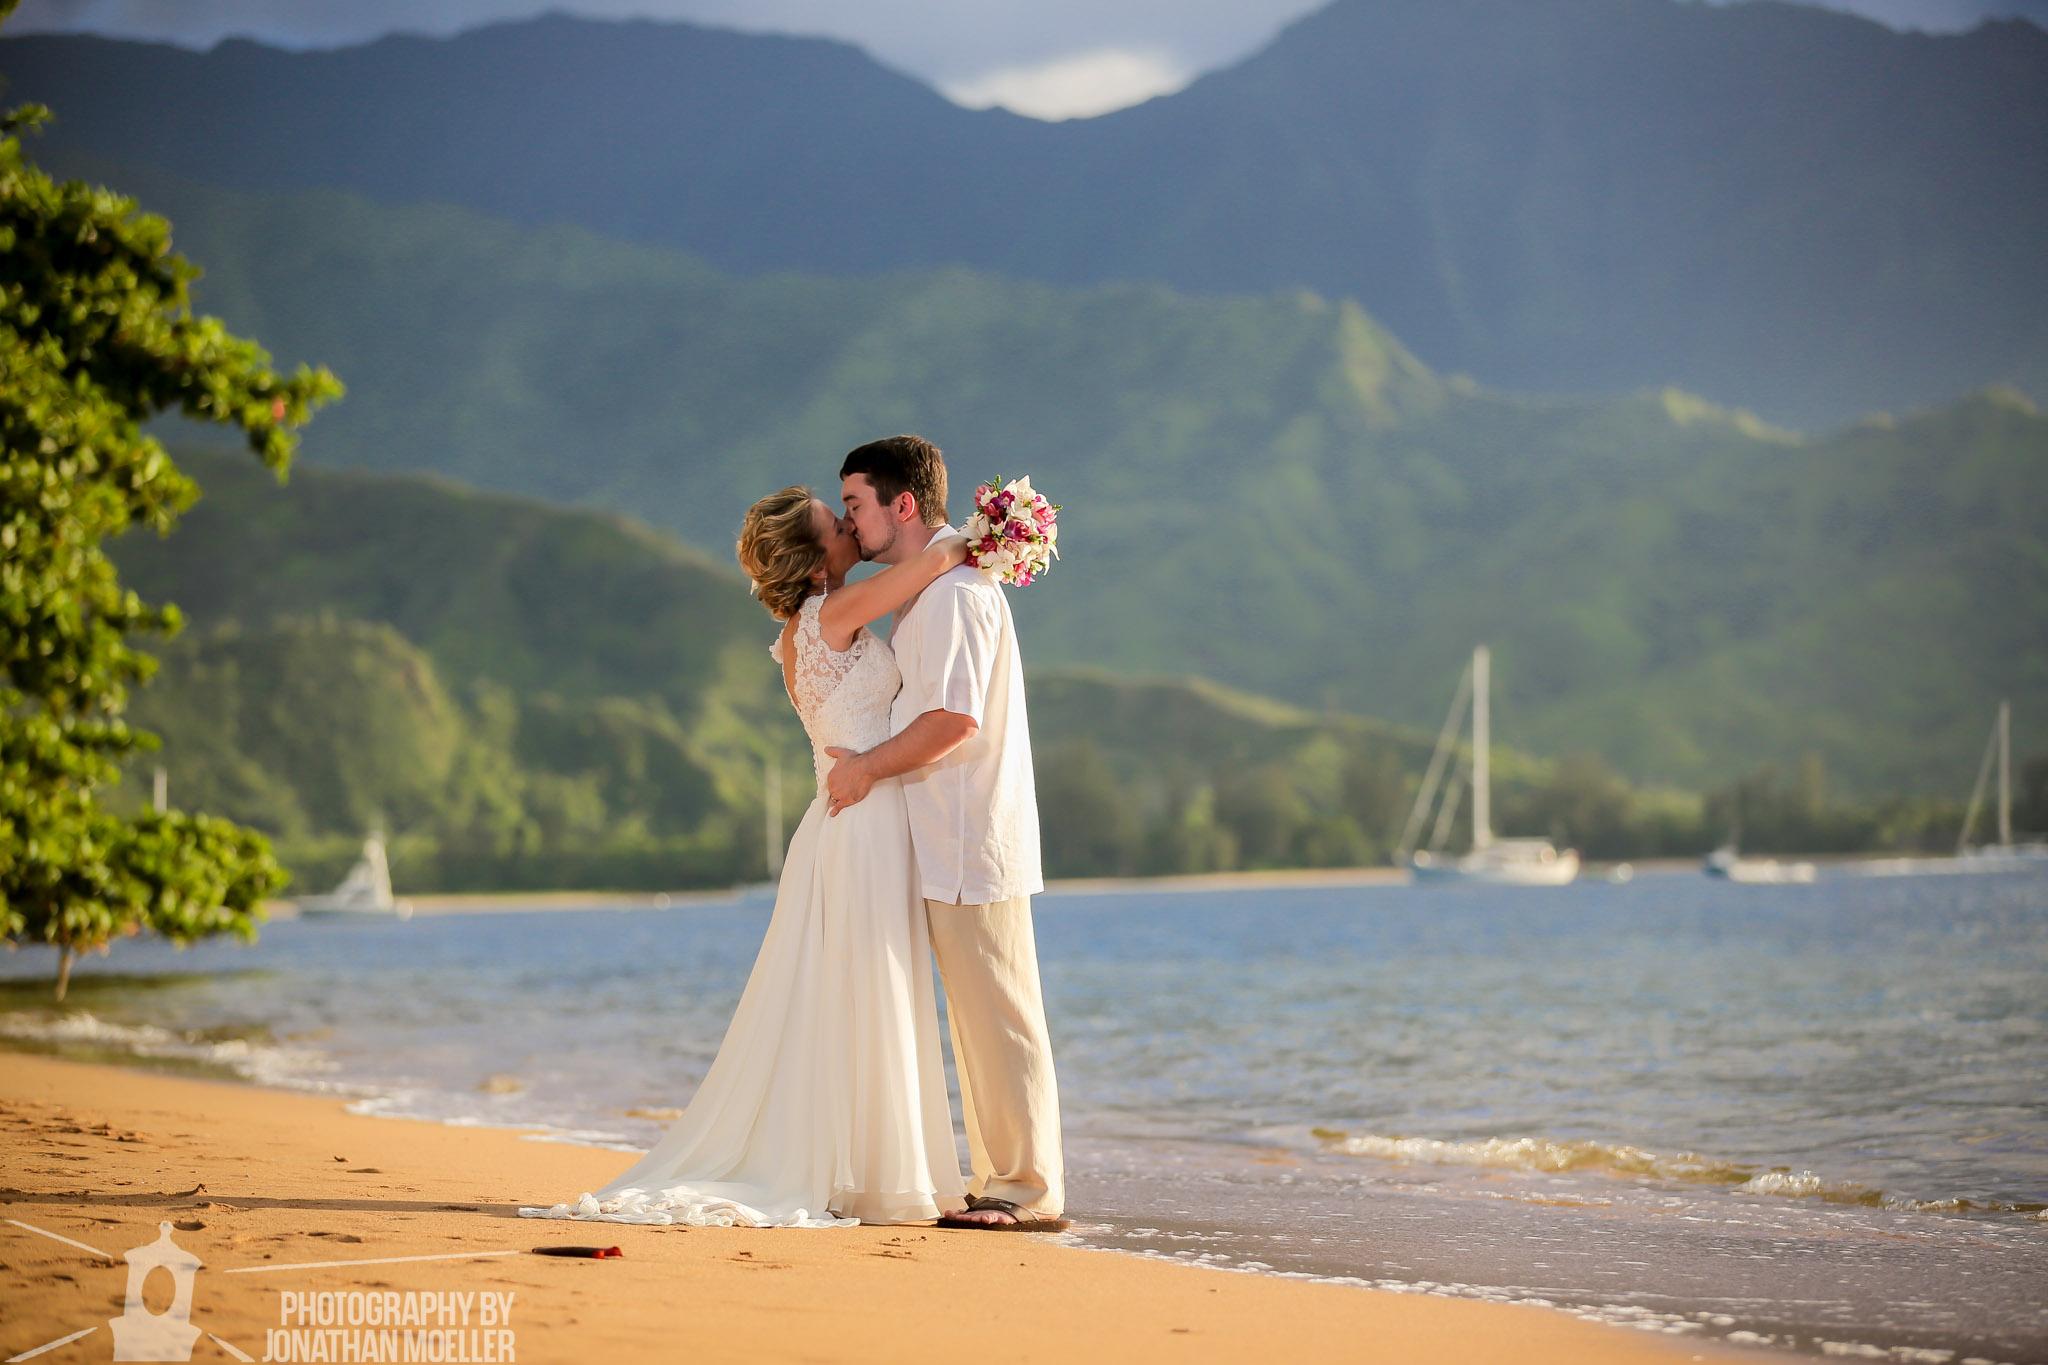 Couple embracing on Puu Poa Beach.